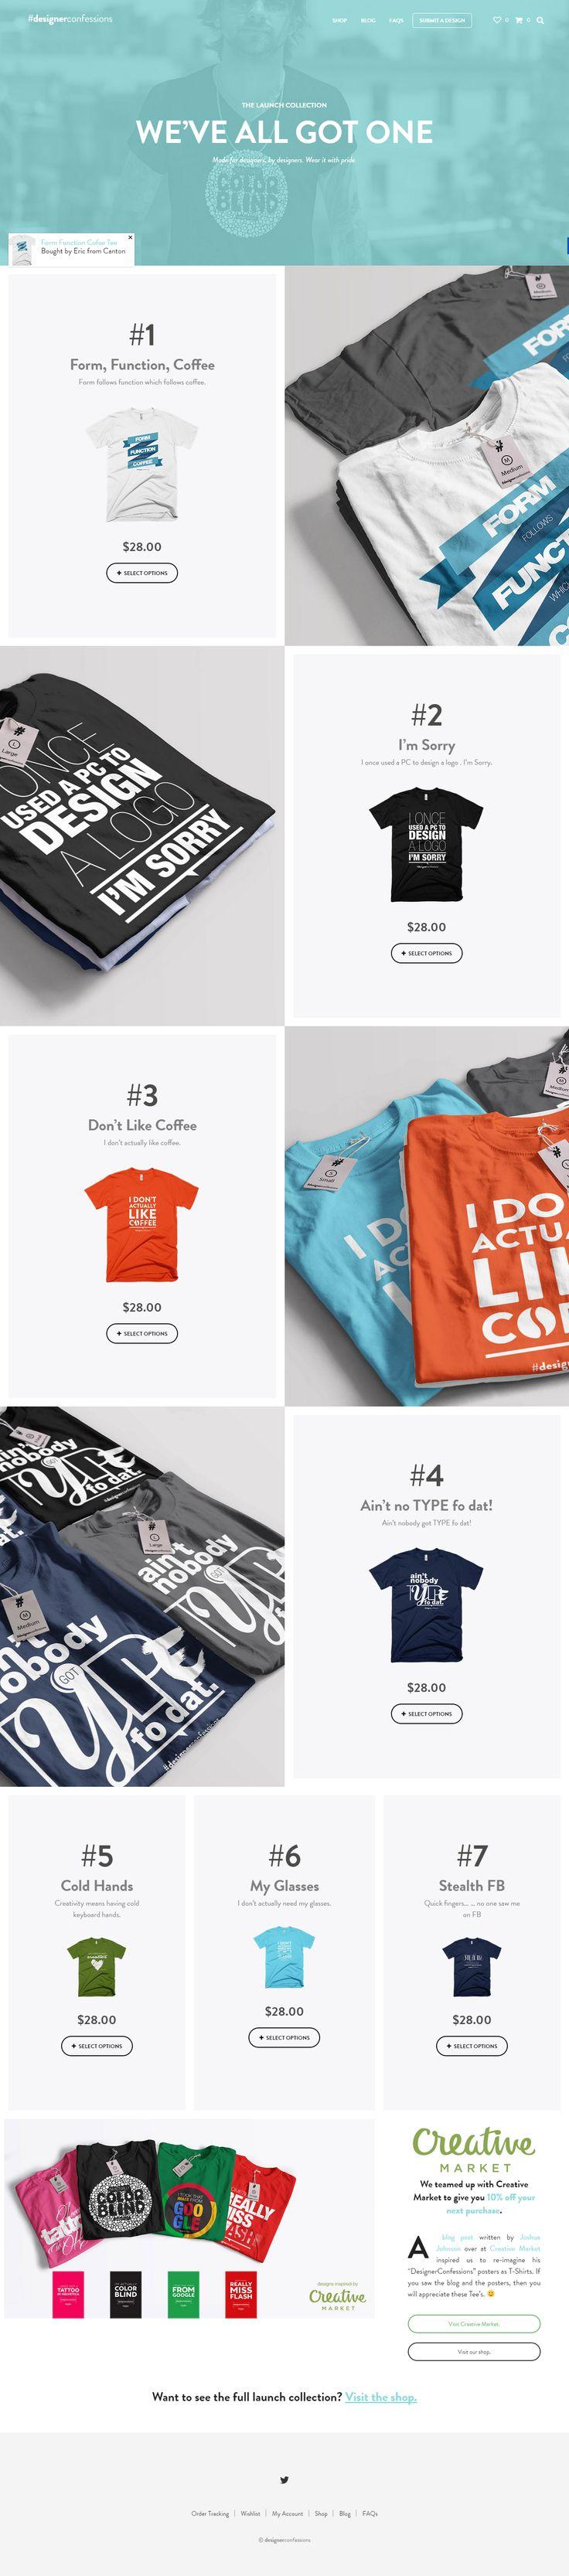 Meet Jason Mark of www.designerconfessions.com, built with our latest #wordpress #theme, Shopkeeper. http://www.getbowtied.com/customer-stories-meet-jason-mark-of-designerconfessions/?utm_source=pinterest.com&utm_medium=social&utm_content=designer-confessions&utm_campaign=customer-stories